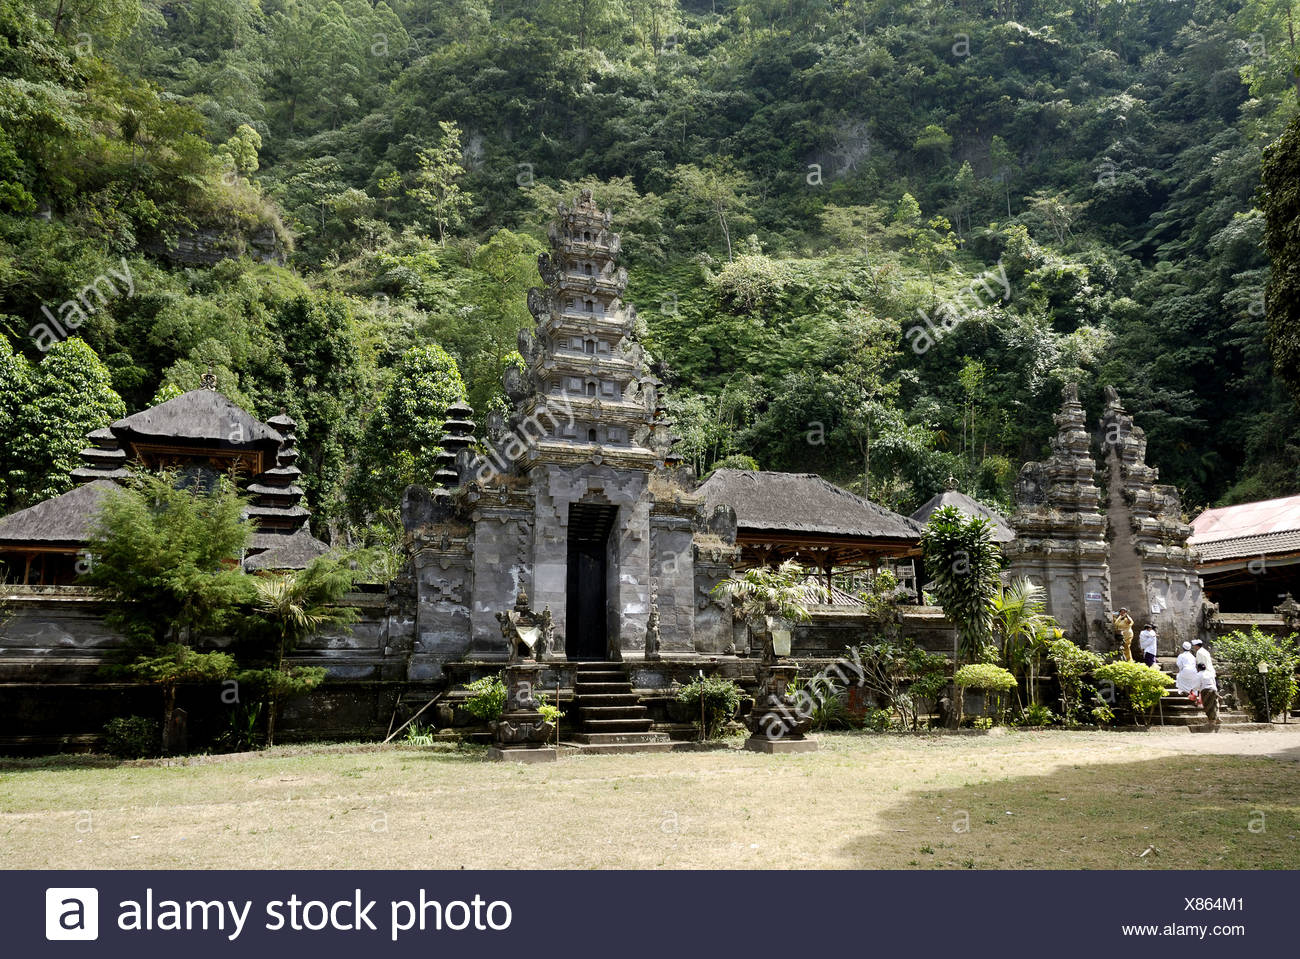 Pura Batur (Kintamani) - Bali, Indonesia - Stock Image